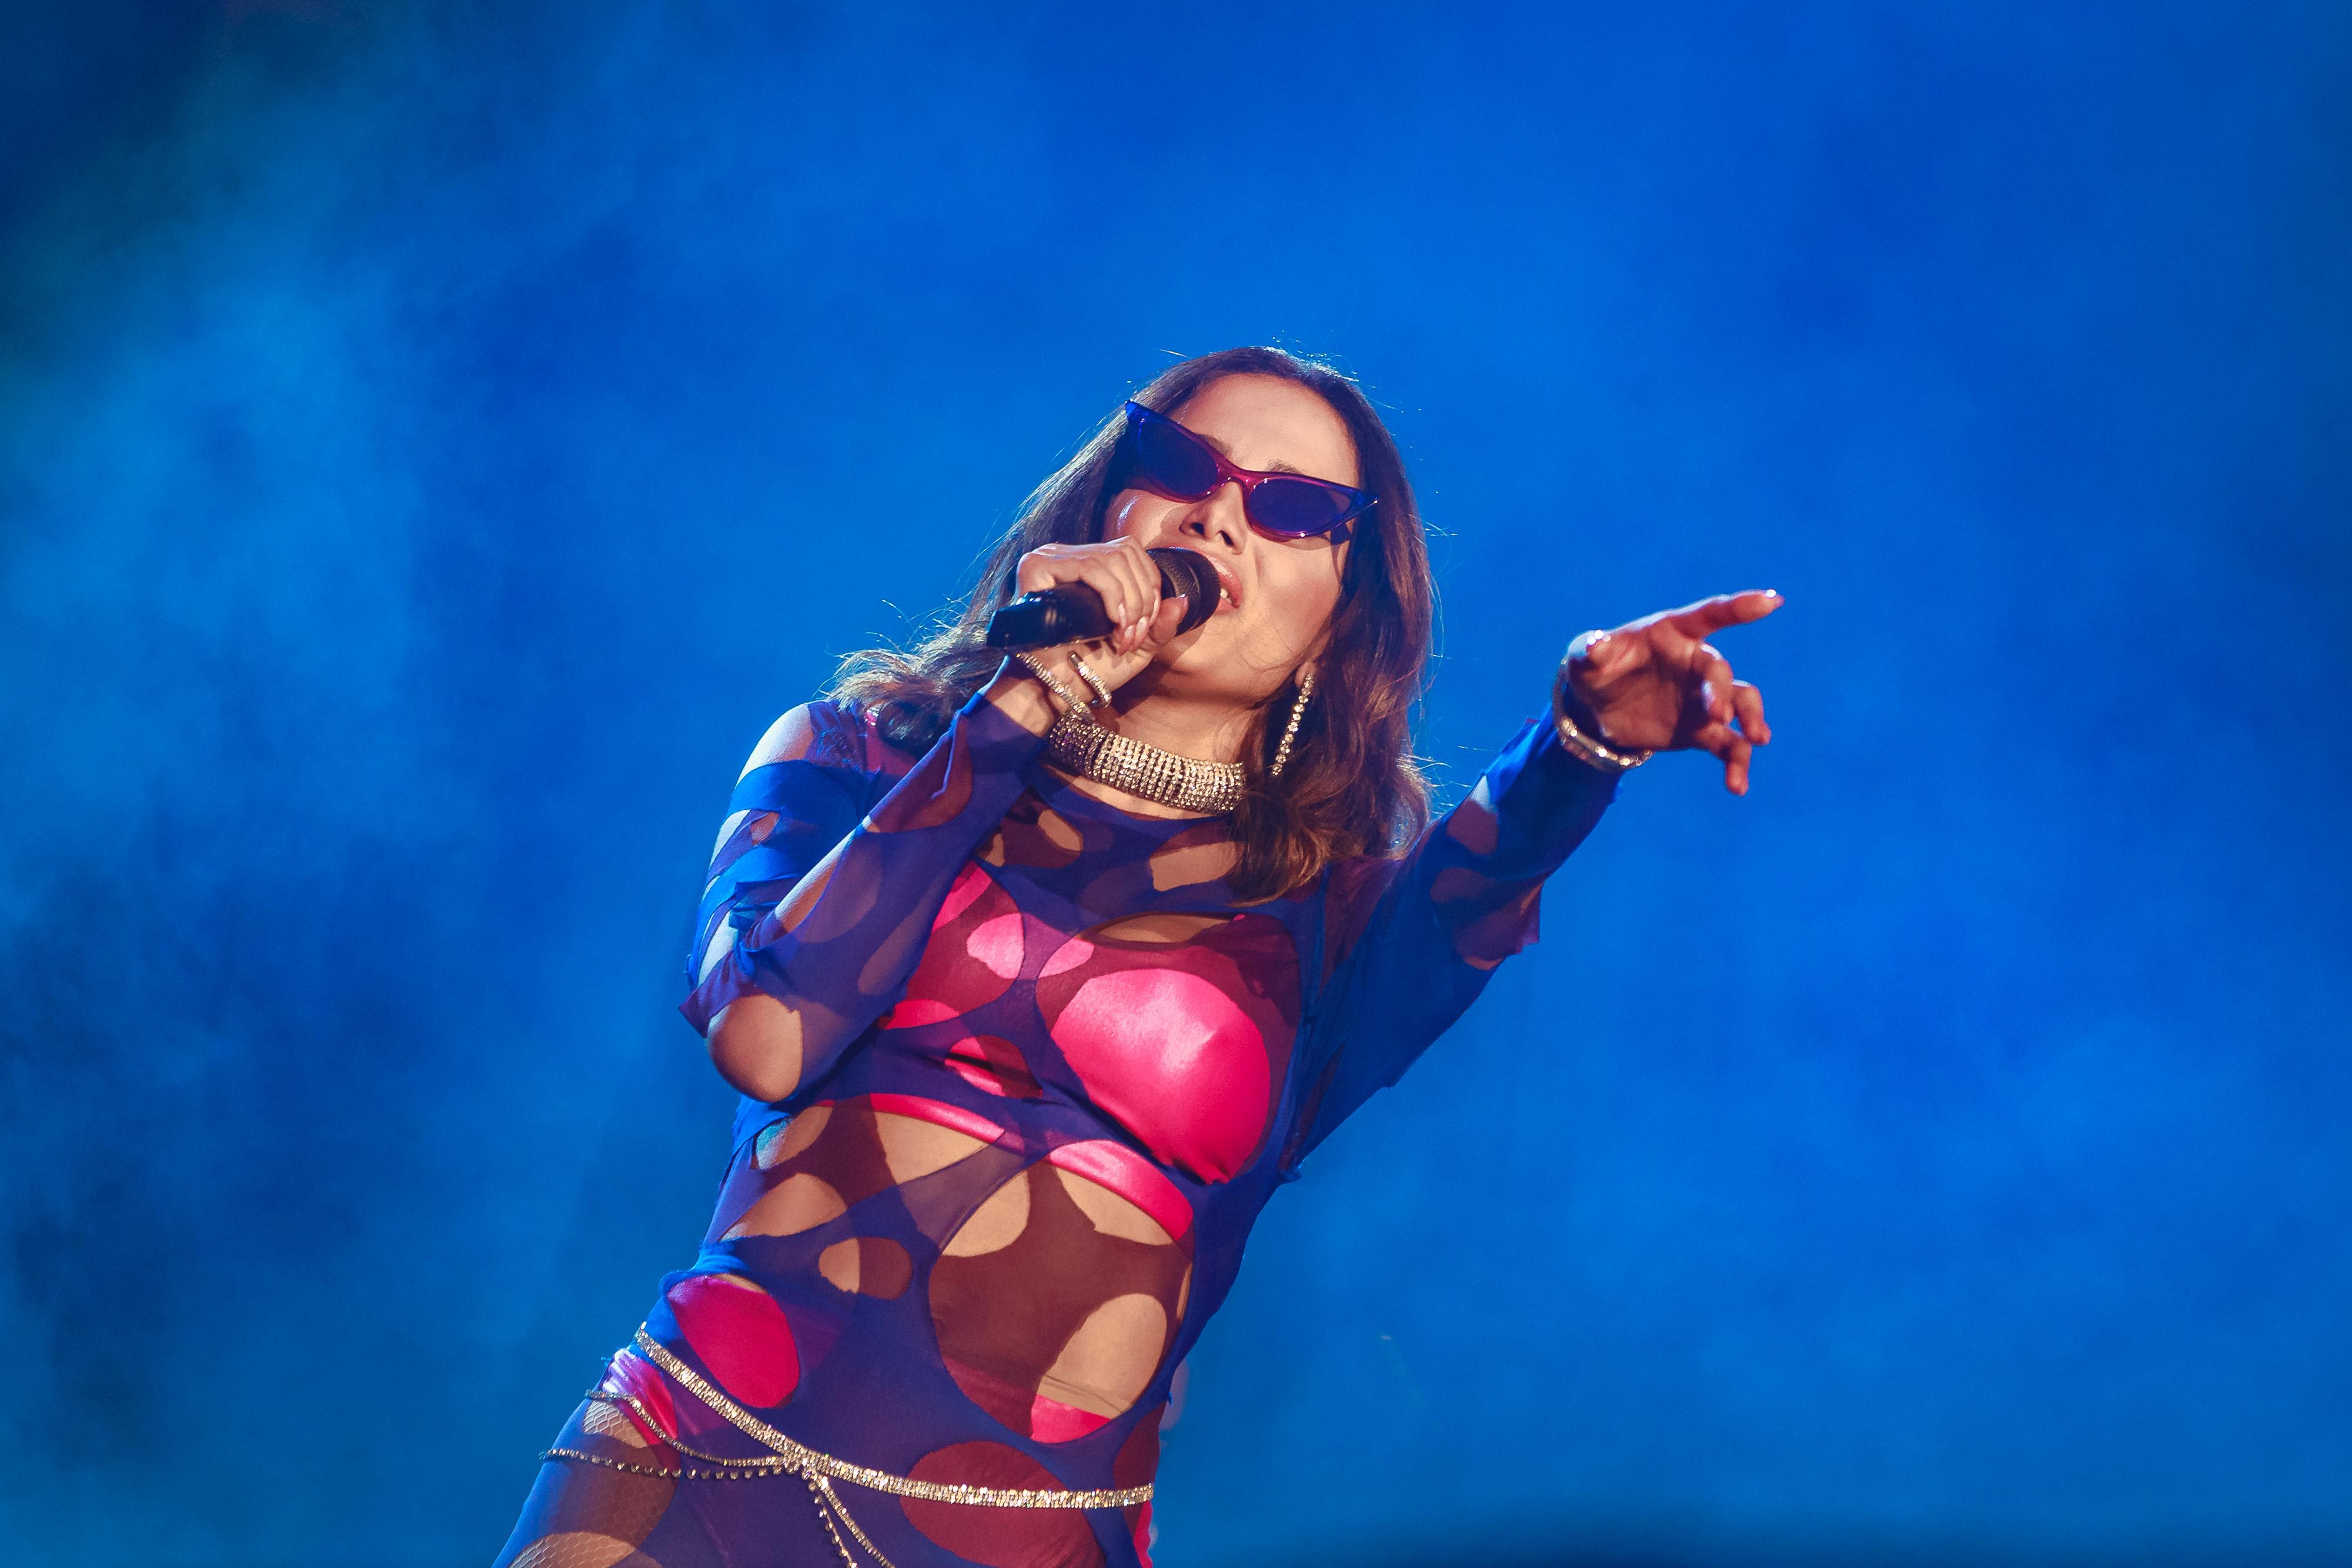 Resultado de imagem para anitta rock in rio 2019